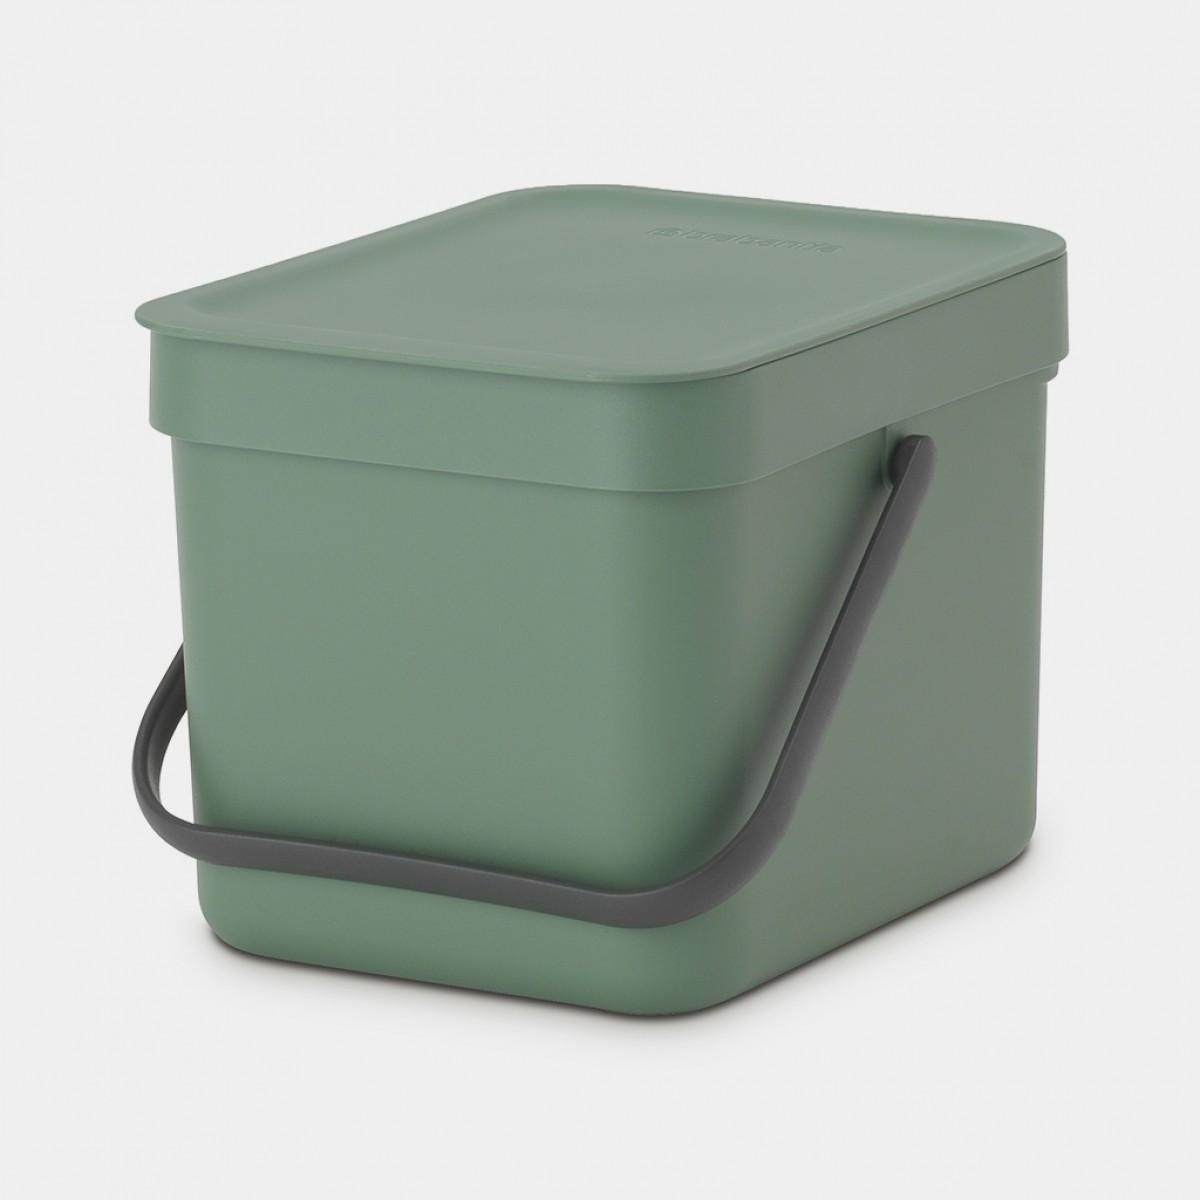 BRABANTIA Affaldsspand m/ låg - affaldssortering.. 6 ltr. grøn